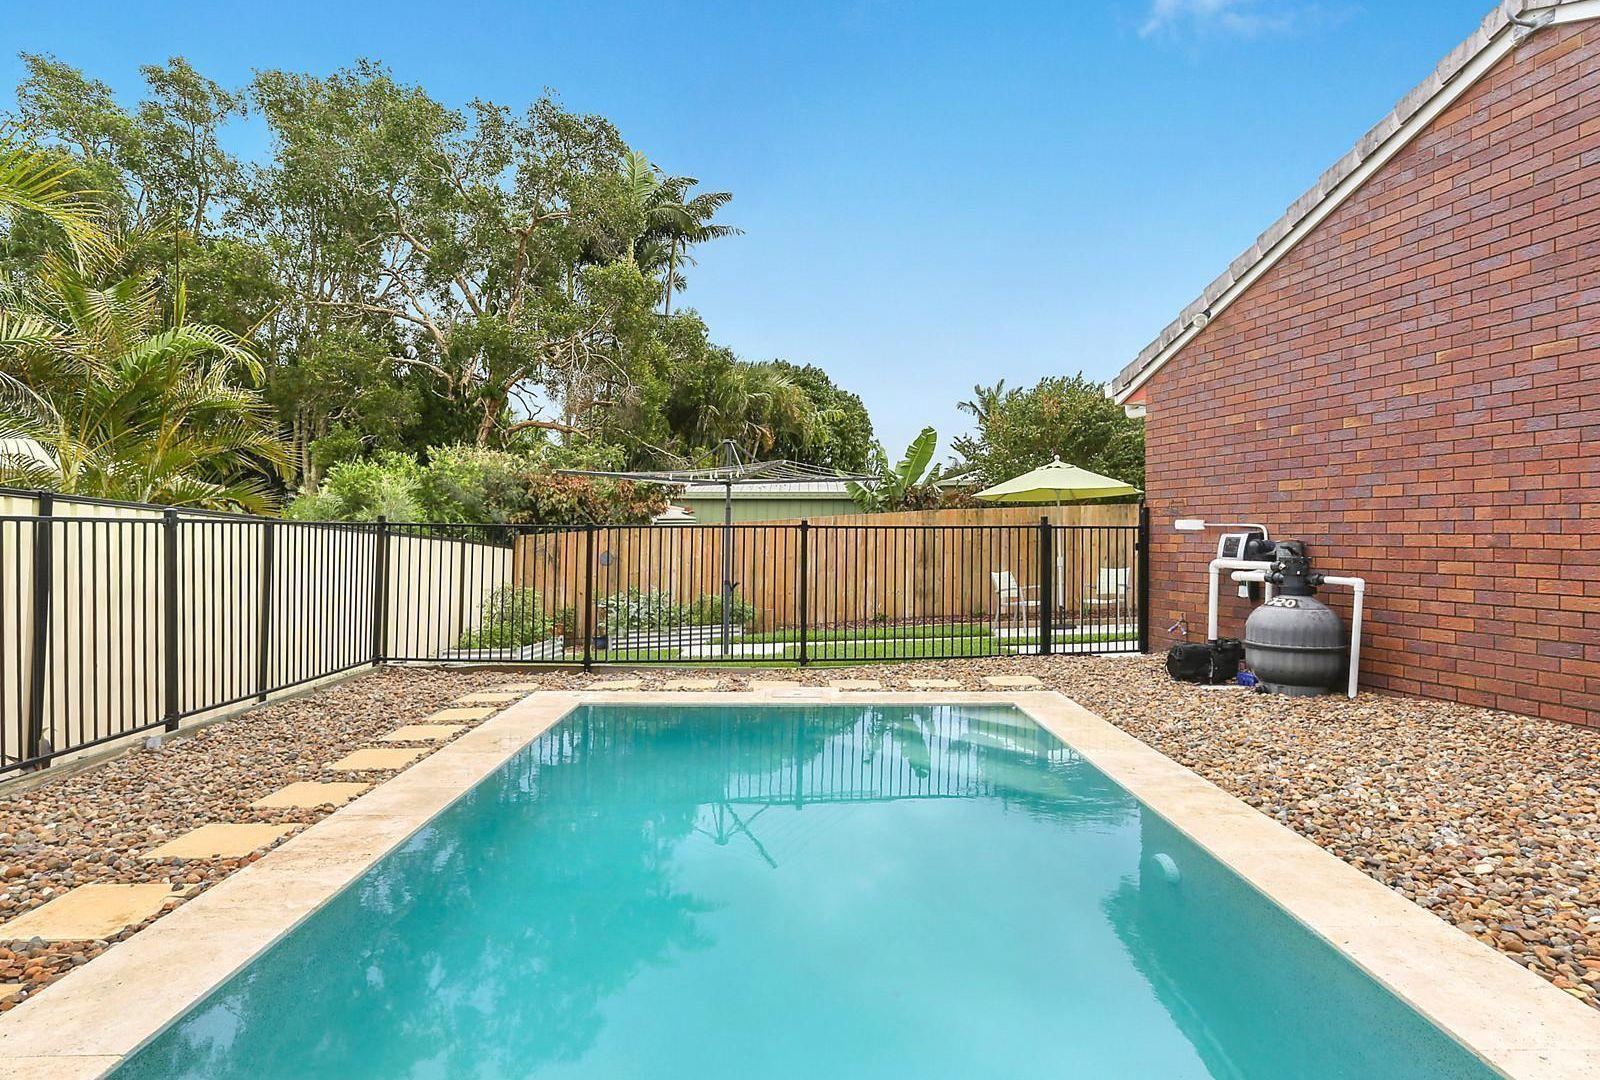 53 Gympie Street, Tewantin QLD 4565, Image 1